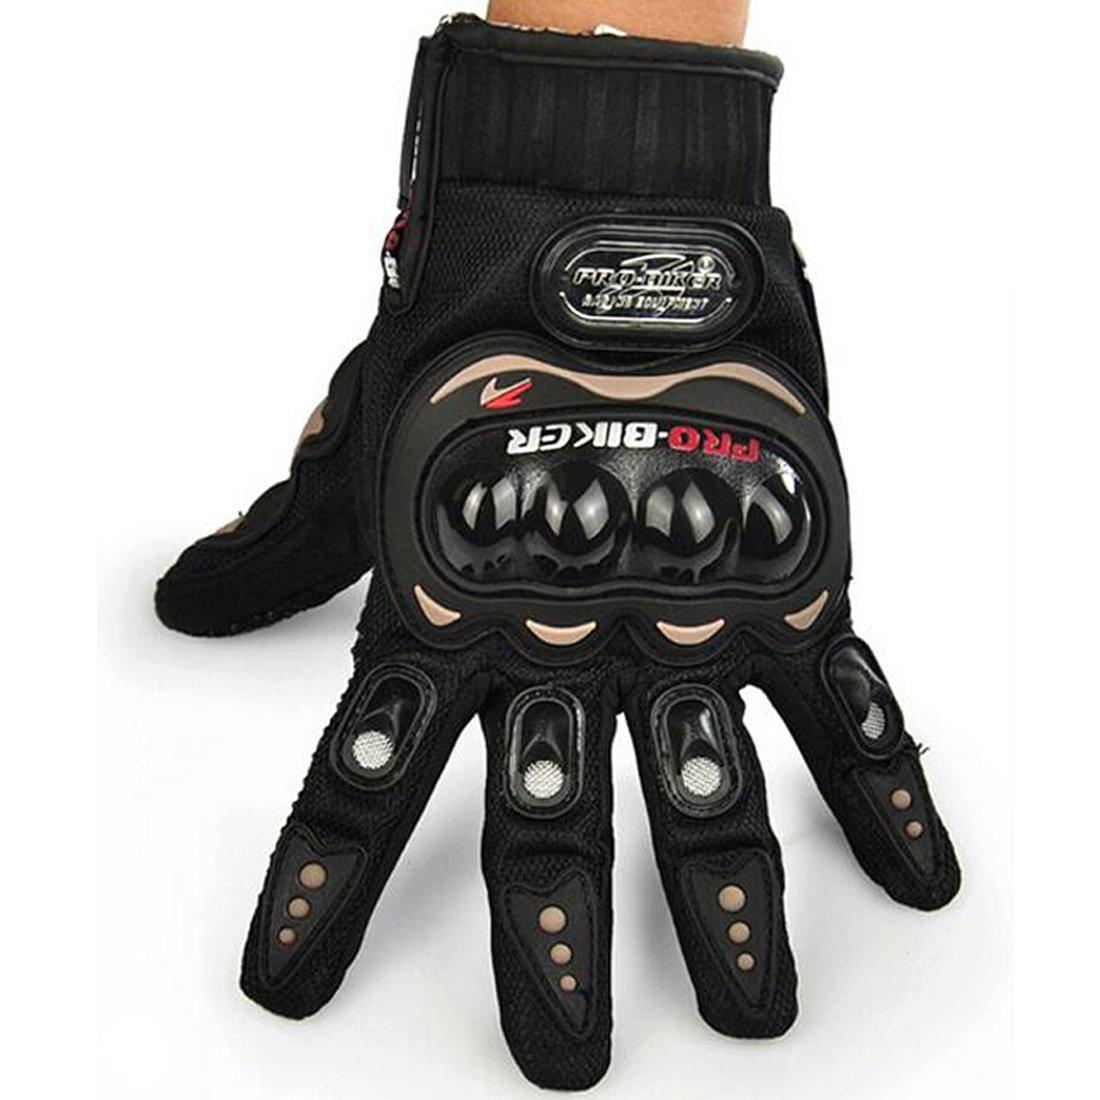 motorrad handschuhe held secret dry handschuhe with. Black Bedroom Furniture Sets. Home Design Ideas